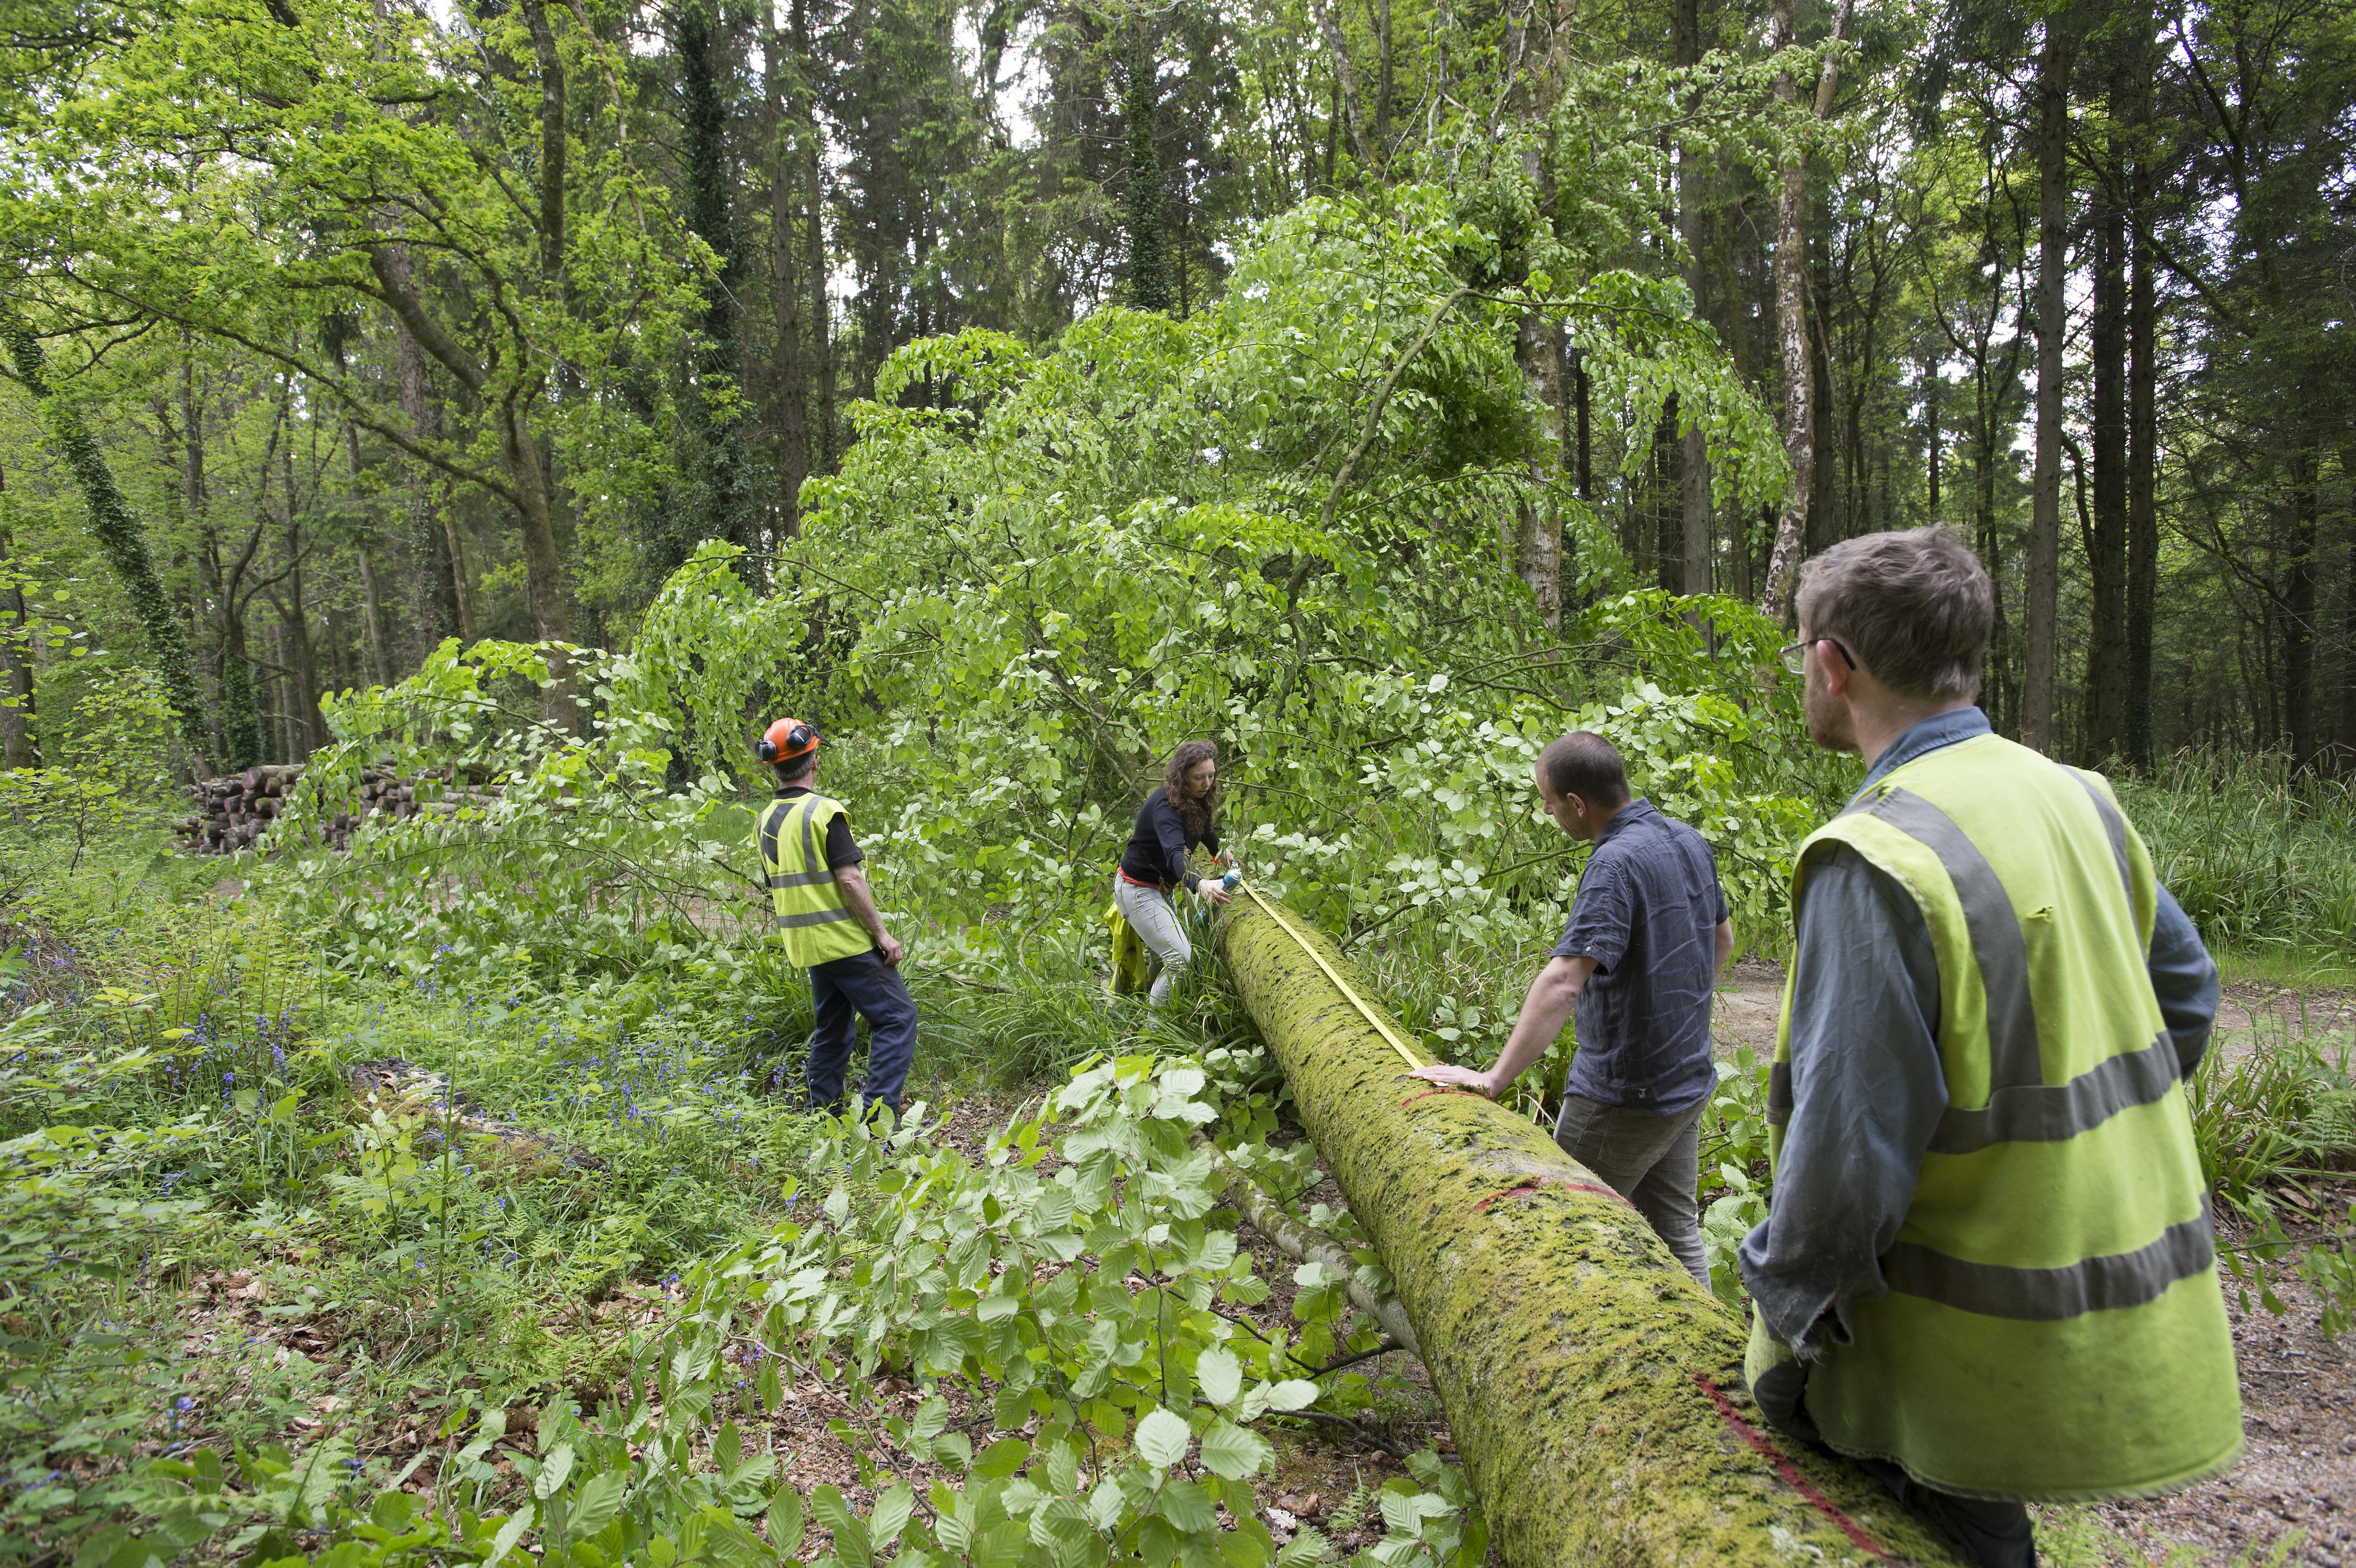 Hooke_Park_Design_&_Make_Timber_Seasoning_Shelter_Group_choosing_&_measuring_trees_VB_2013_06_03_0020.JPG